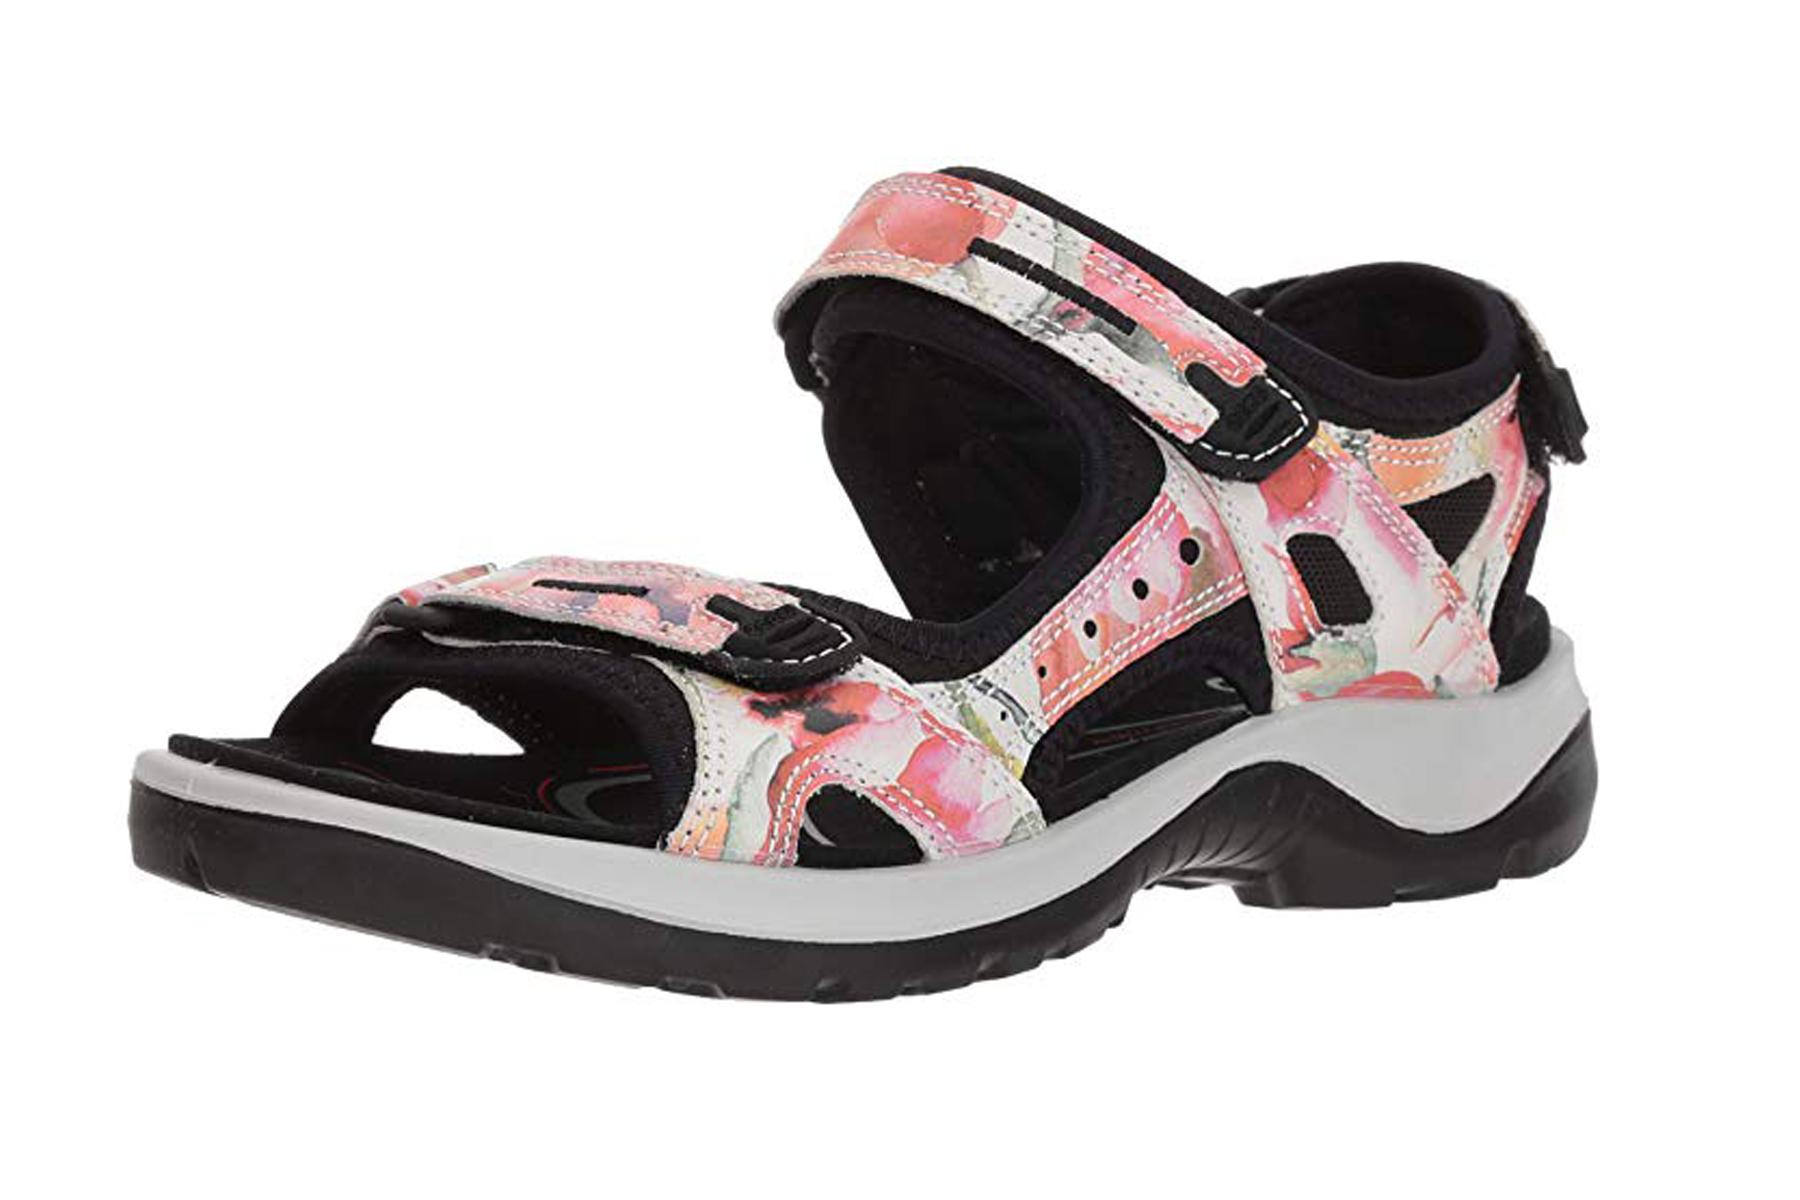 Orthotic sandals